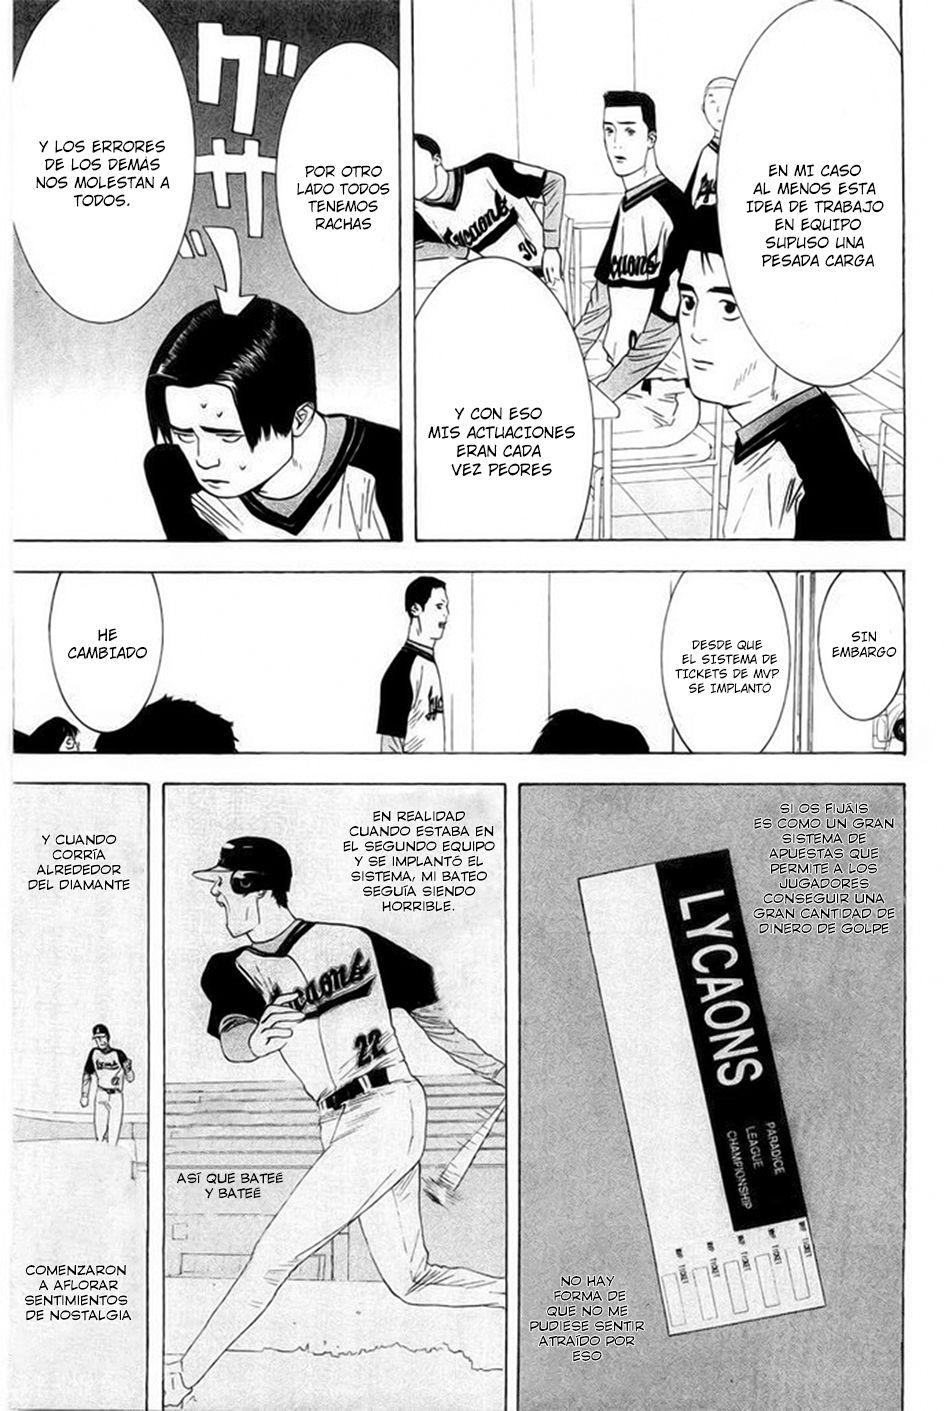 https://c5.ninemanga.com/es_manga/49/2993/463798/8bfd75b1f6a5e7d73f32765d78e7112f.jpg Page 14